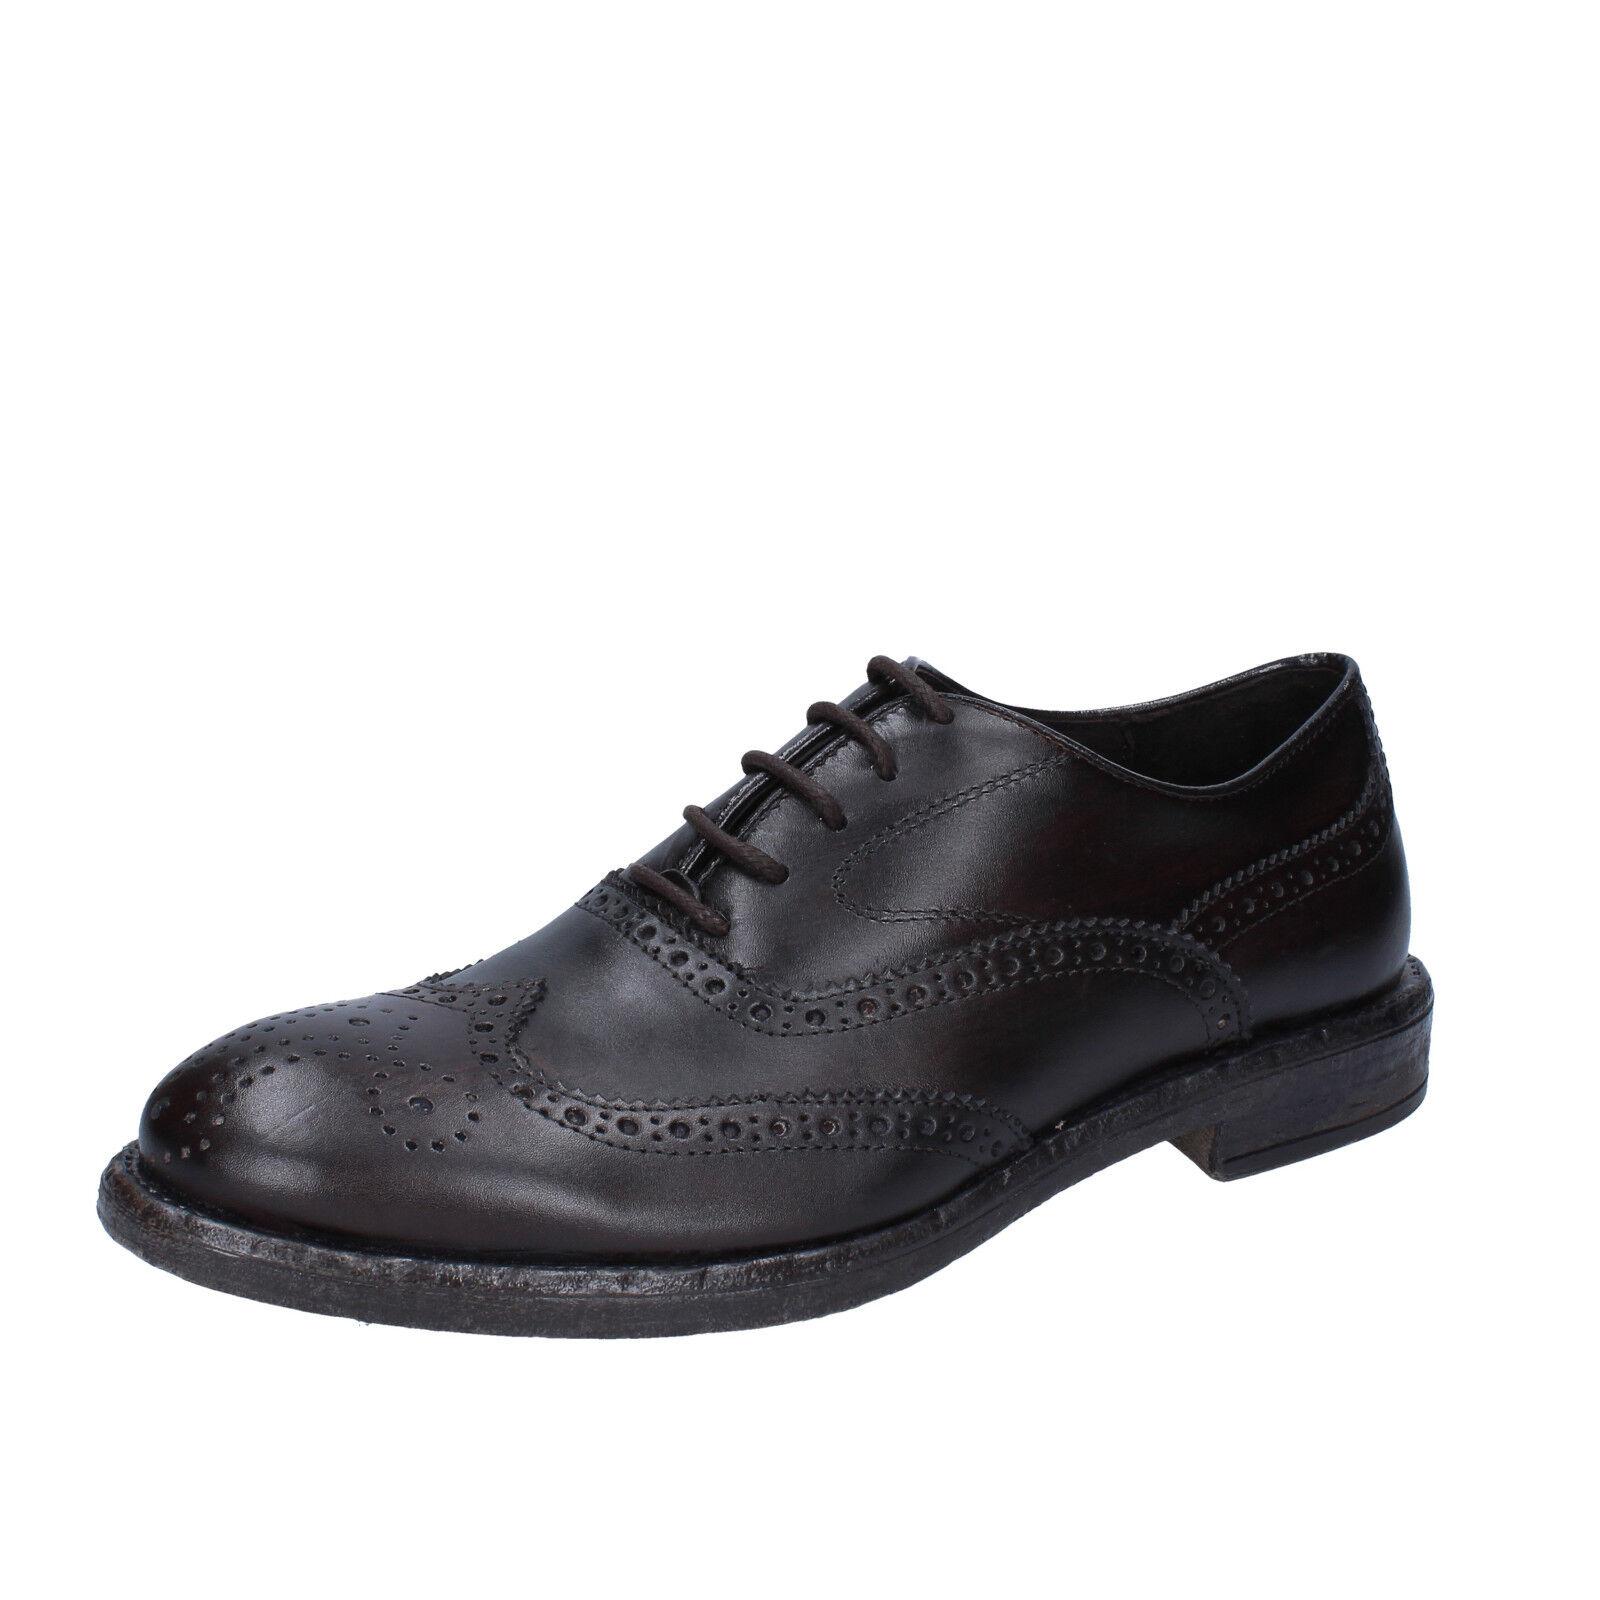 Men's schuhe +2 MADE IN ITALY 10 (EU 43) elegant dark braun leather BX422-43